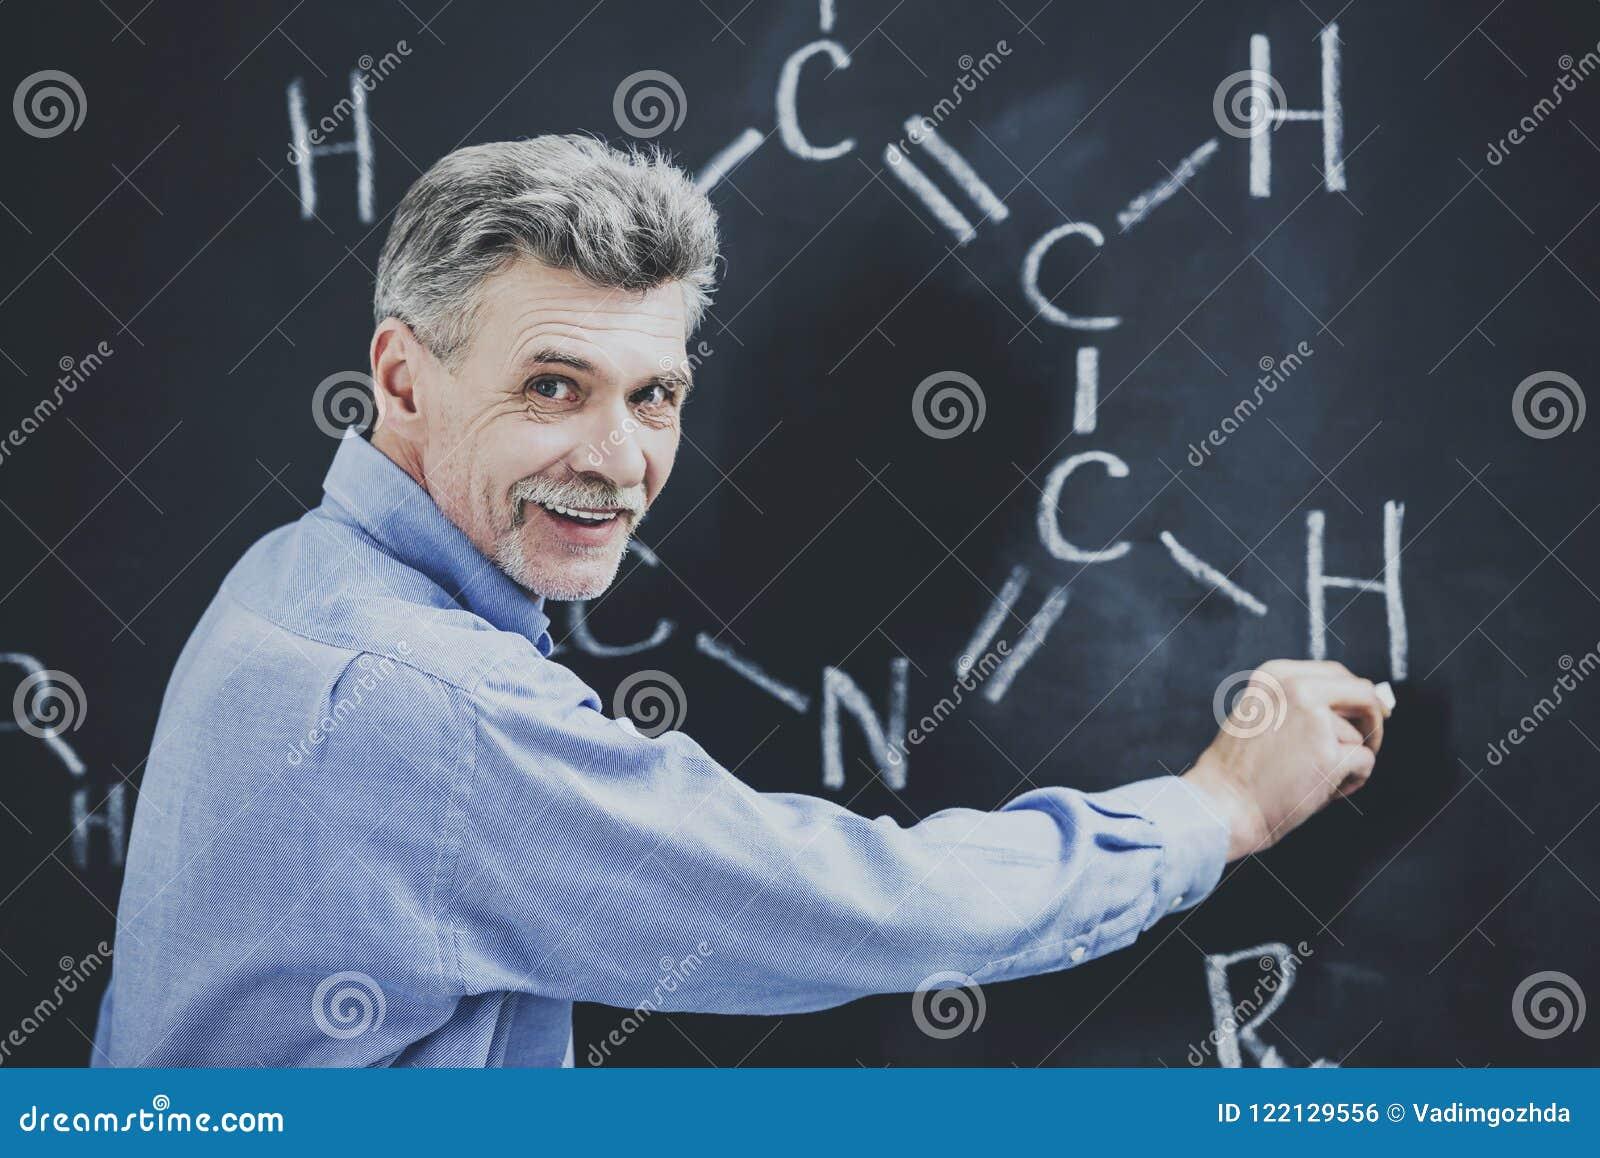 Tema sonriente de profesor Explains New Chemistry